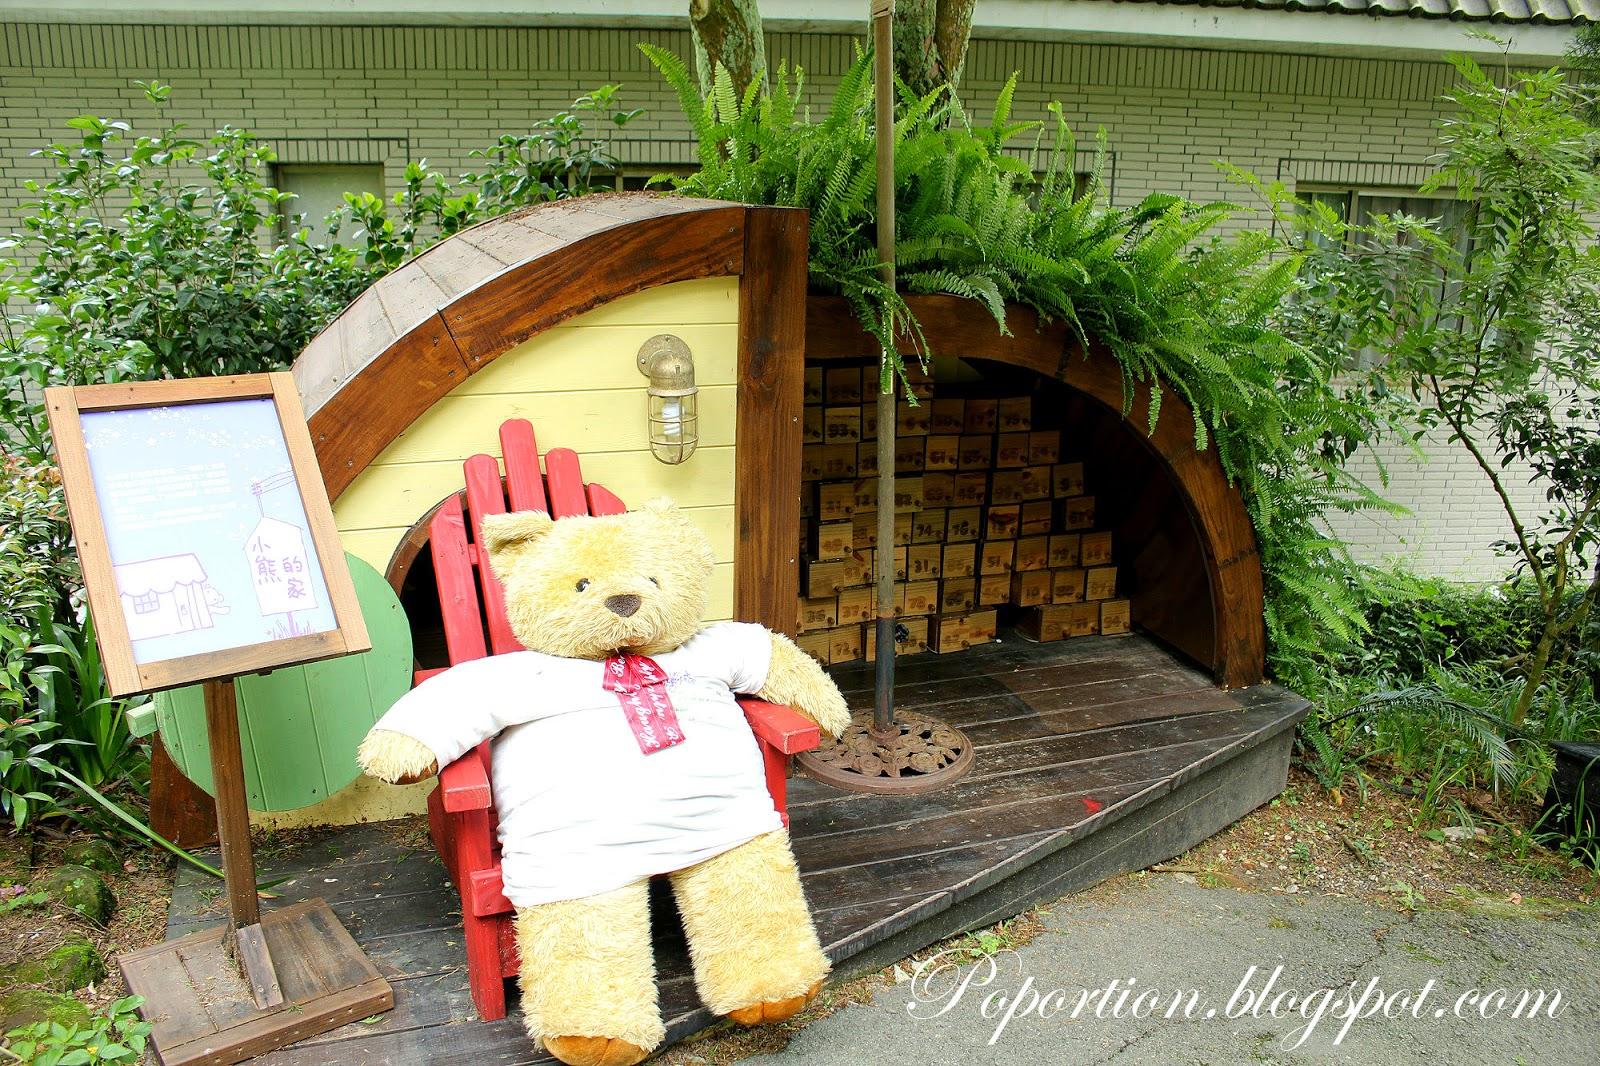 huge teddy bear mascot